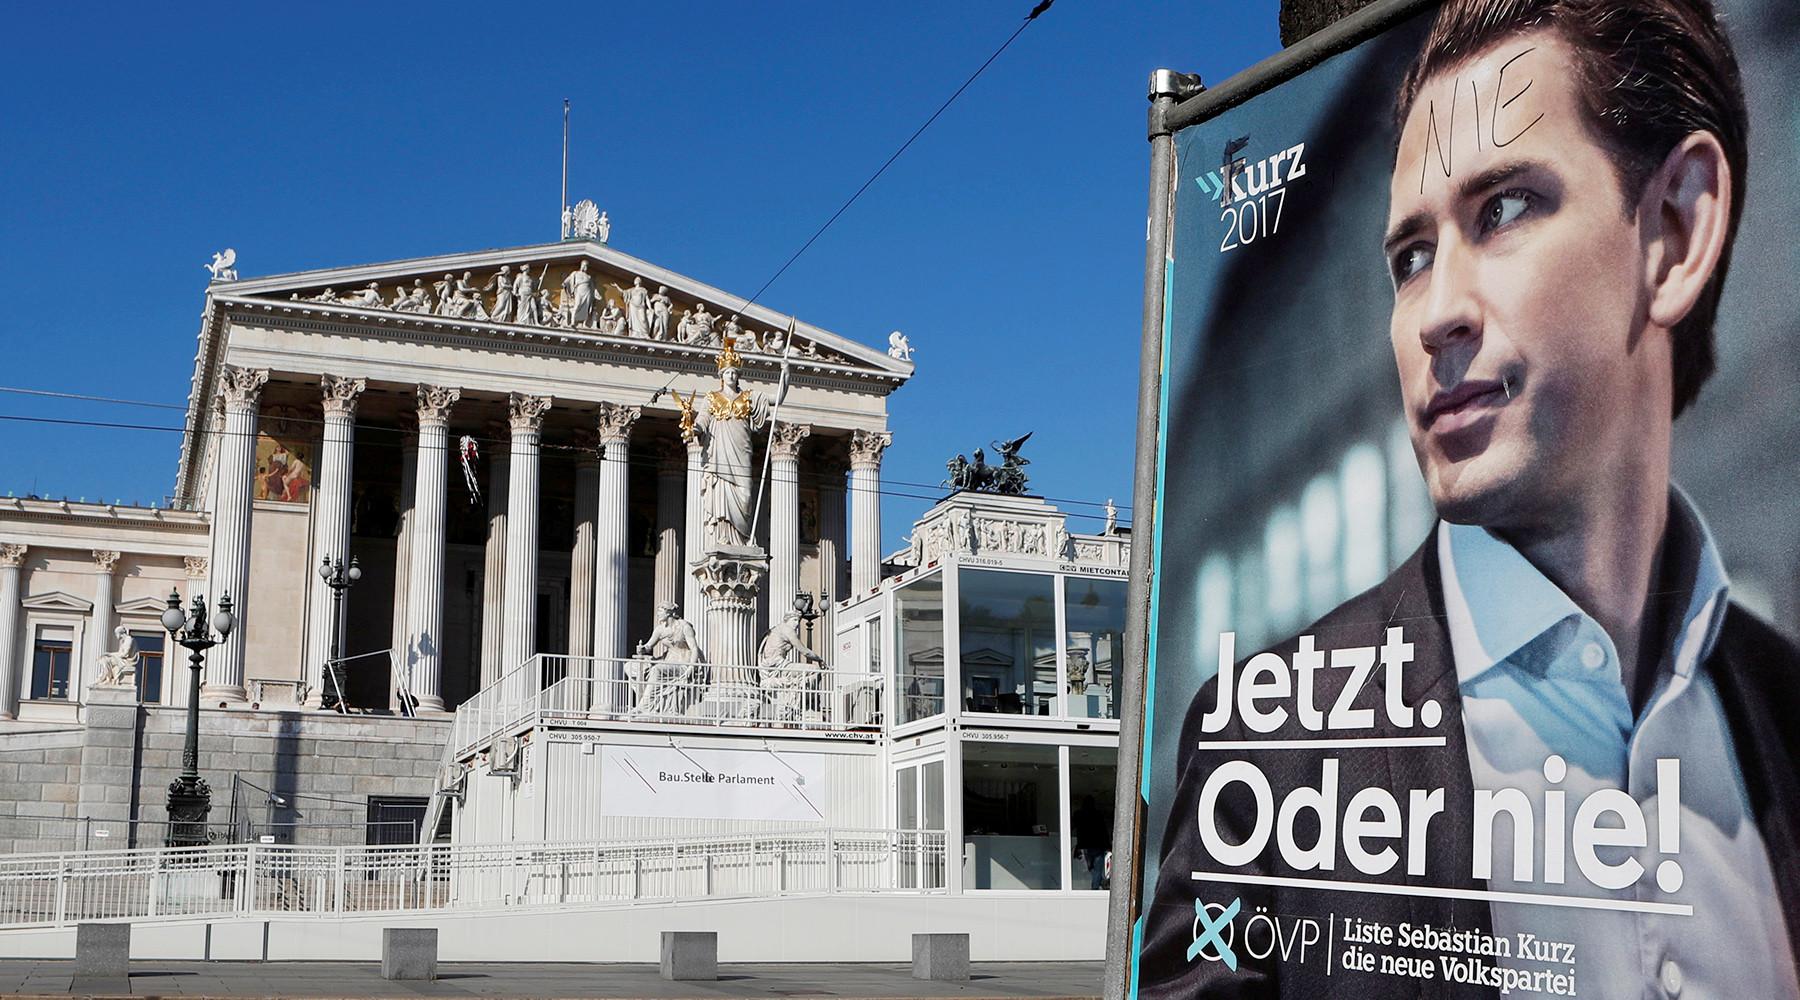 Социал-демократы заняли 2-ое место навыборах вАвстрии